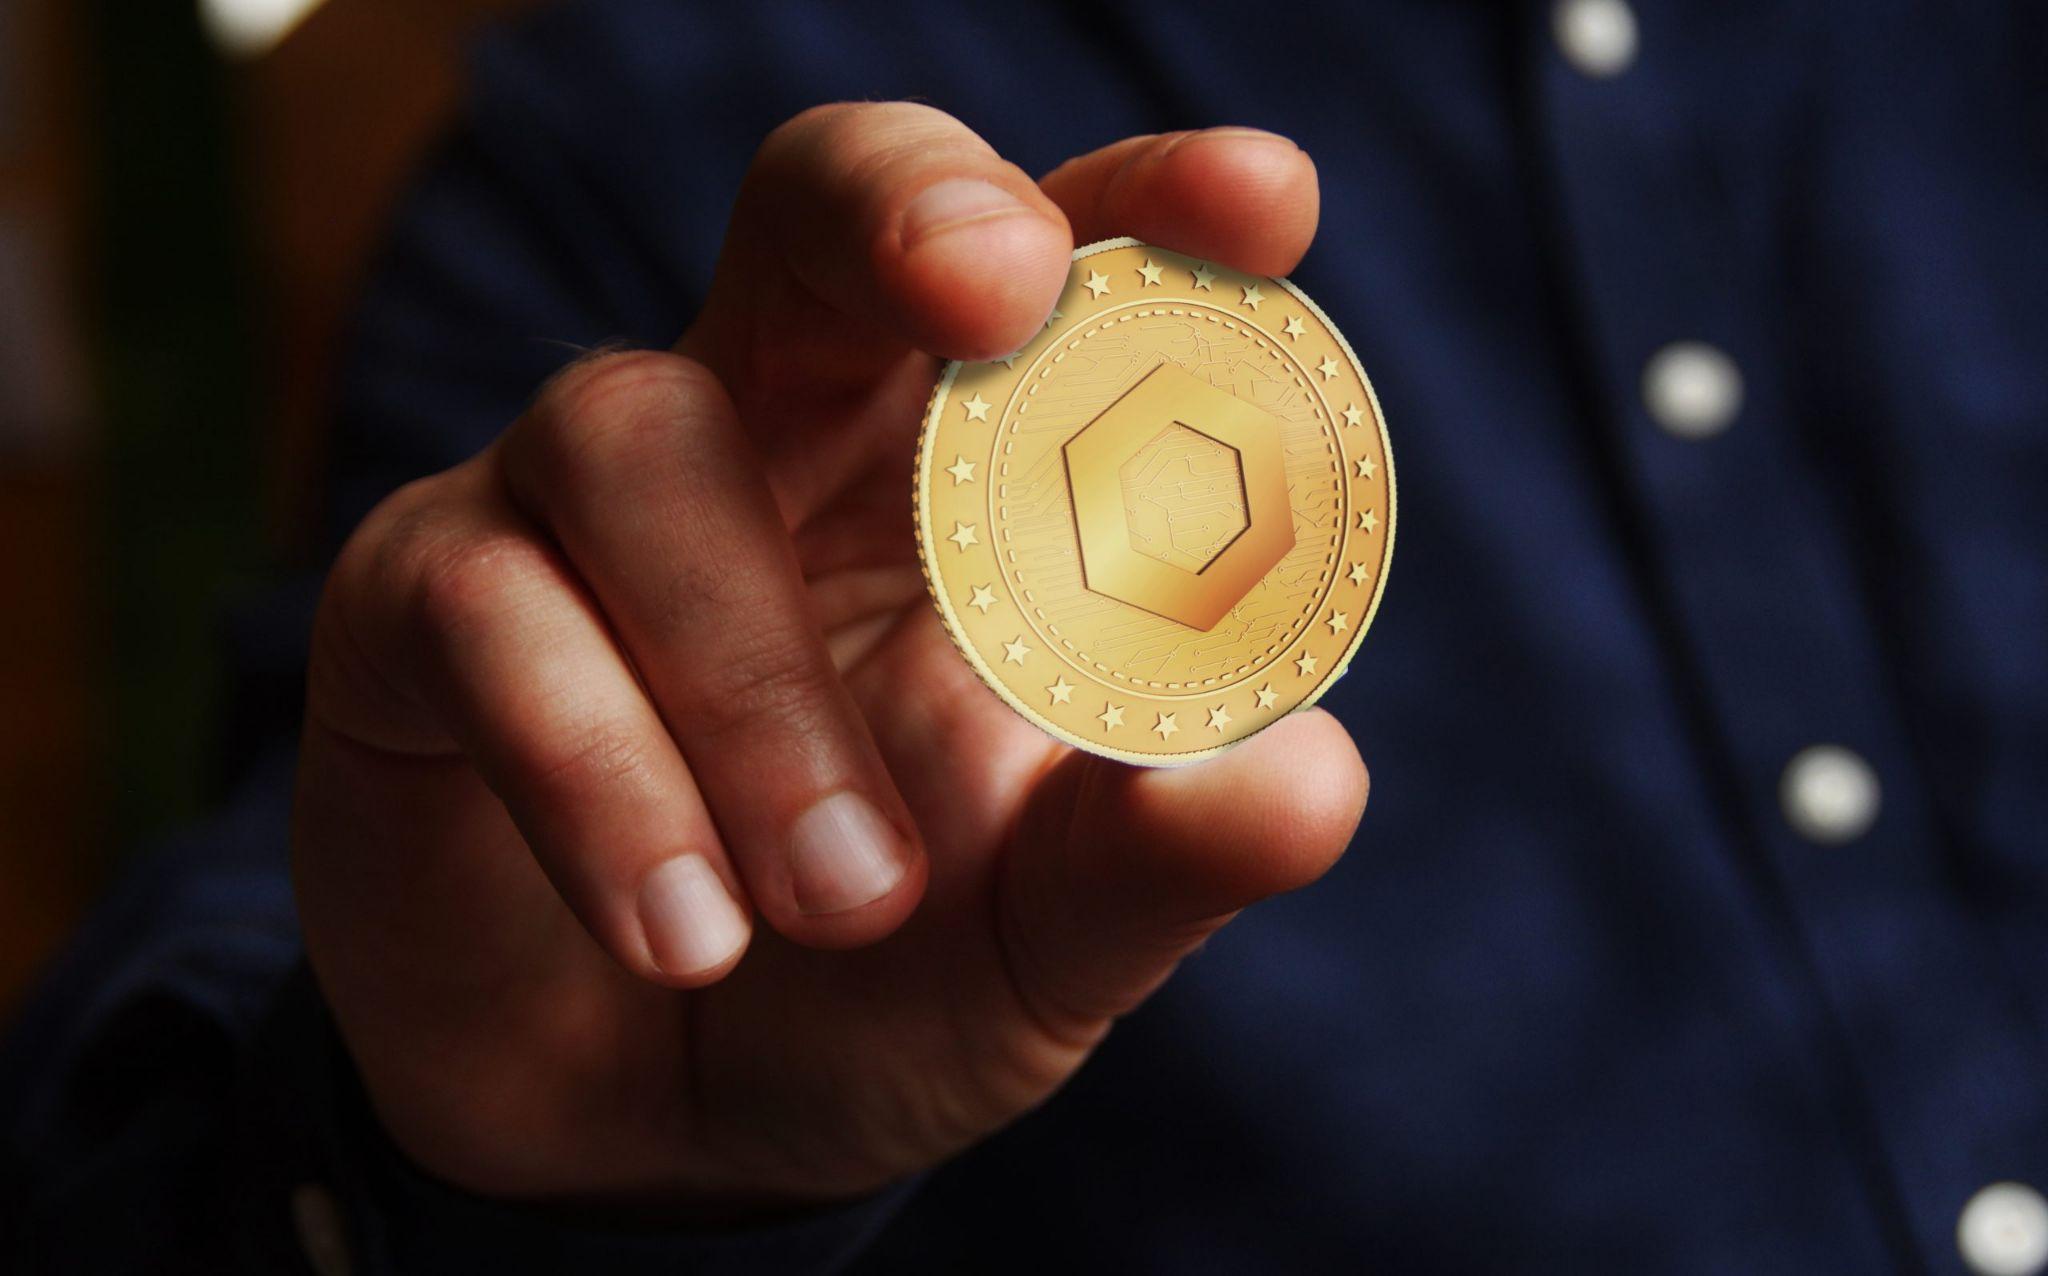 Ilustrasi orang yang sedang memegang koin Chailink